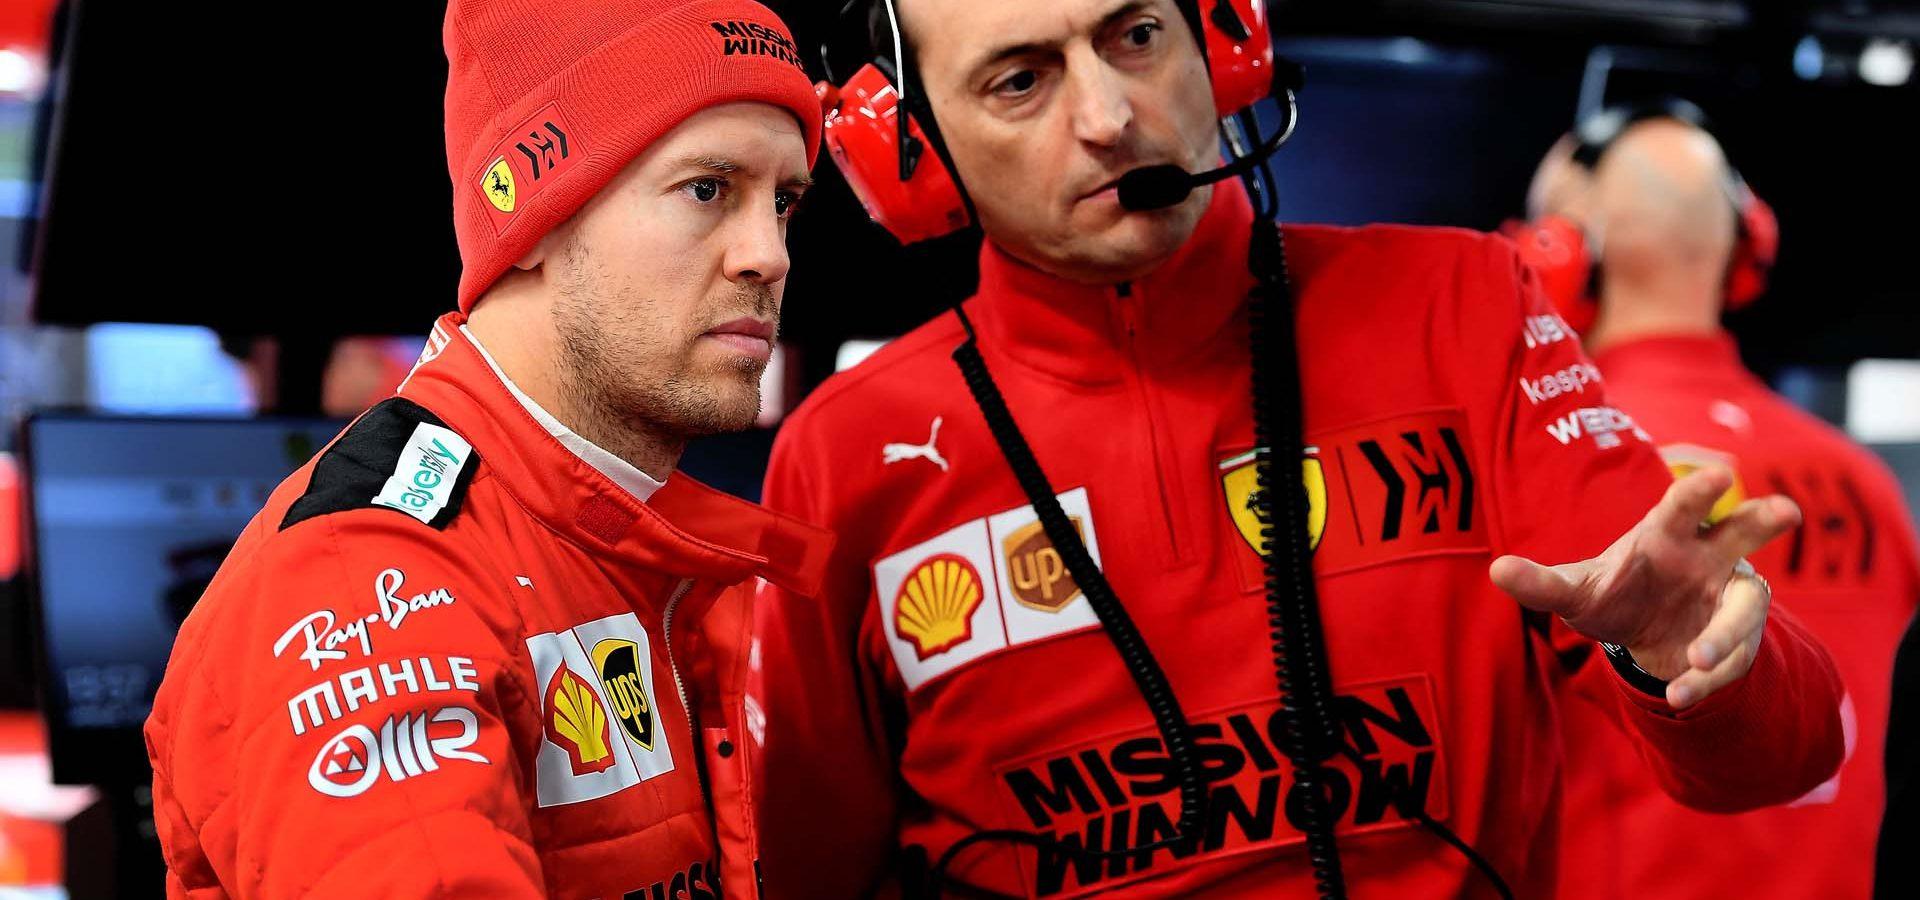 TEST T1 BARCELLONA - VENERDì 21/02/20 - SEBASTIAN VETTEL  CON IL SUO INGEGNERE Ferrari